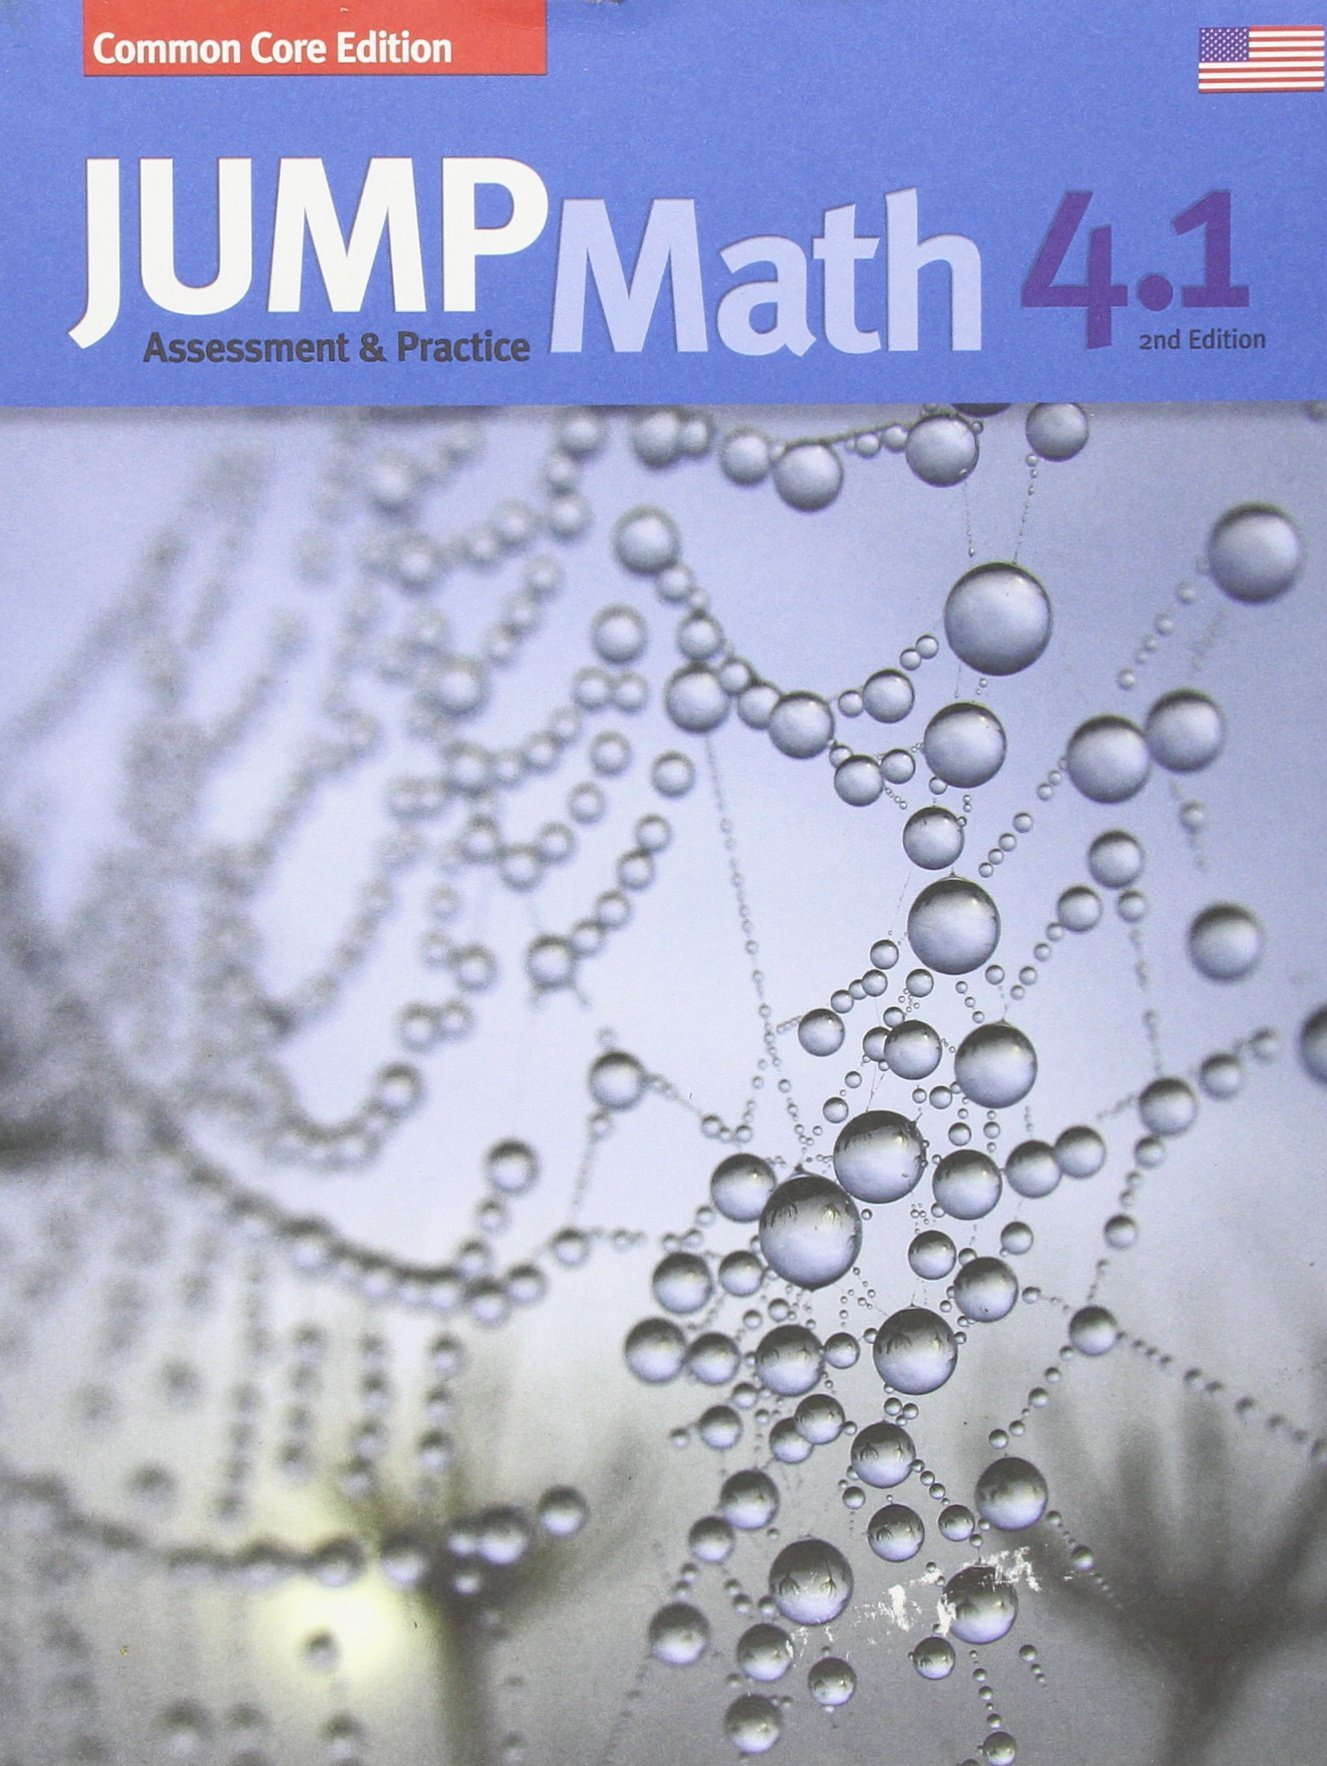 Amazon.com: JUMP Math AP Book 4.1: US Common Core Edition, Revised ...